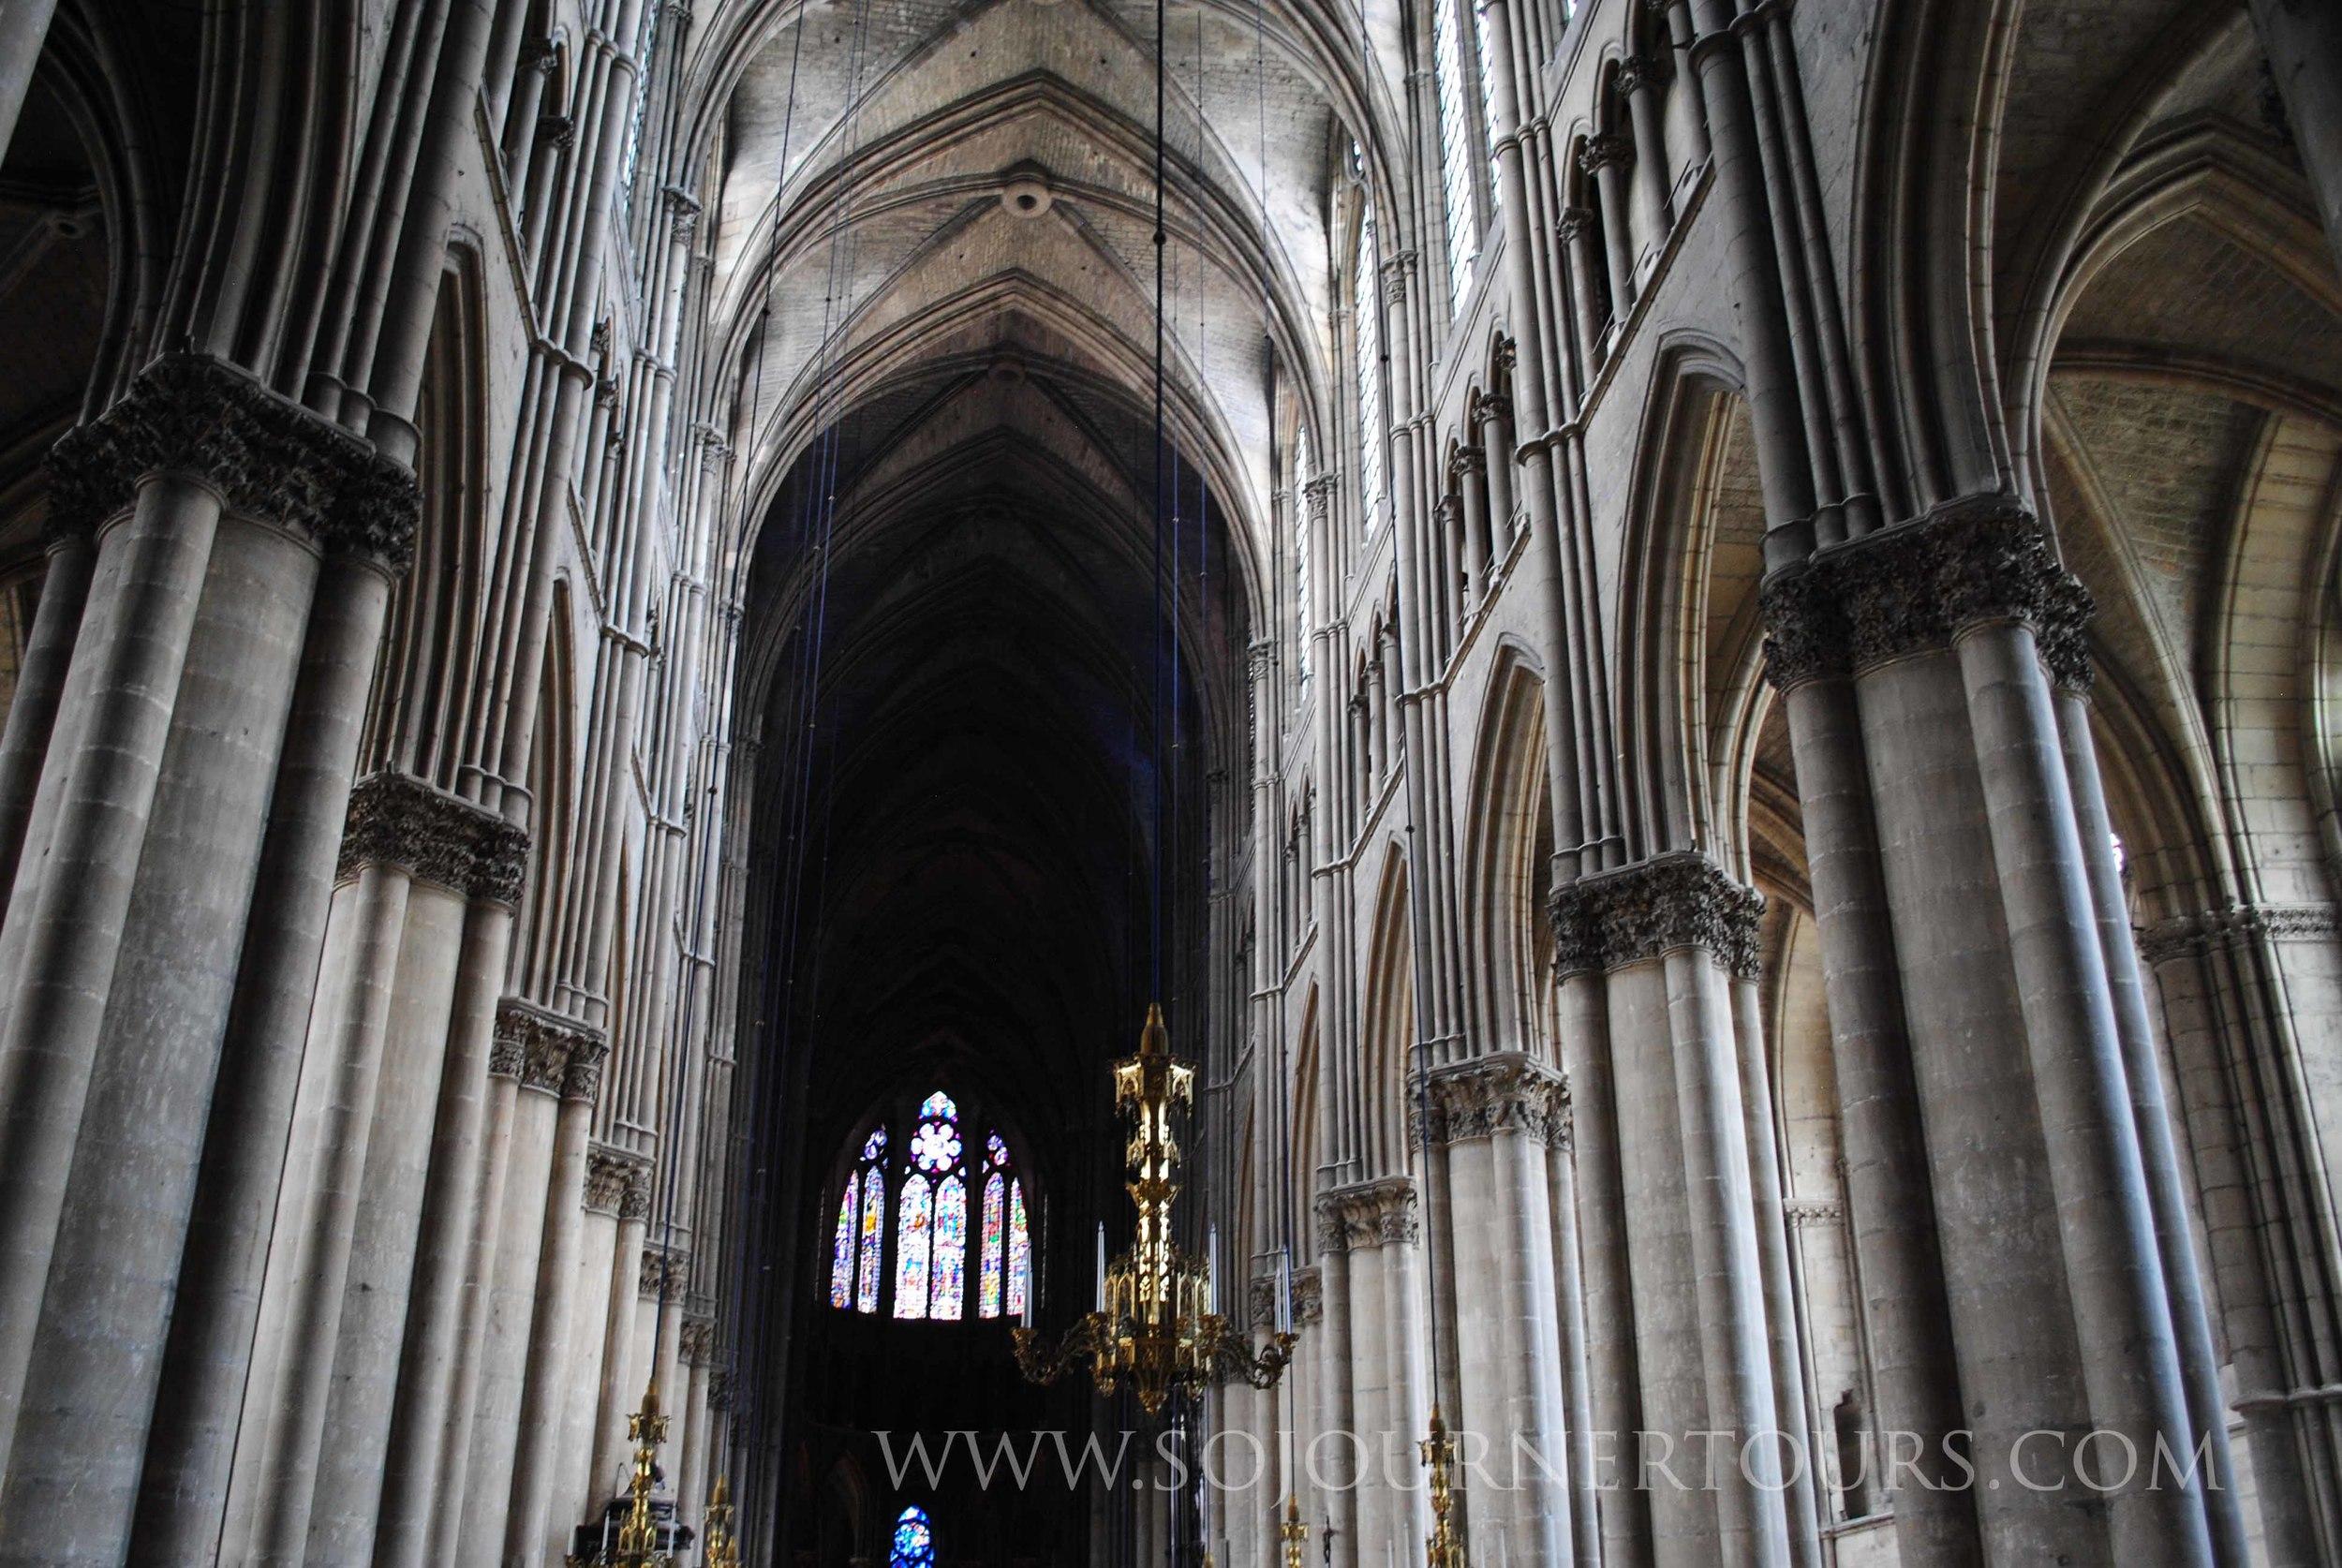 Notre Dame de Reims: Reims, France (Sojourner Tours)